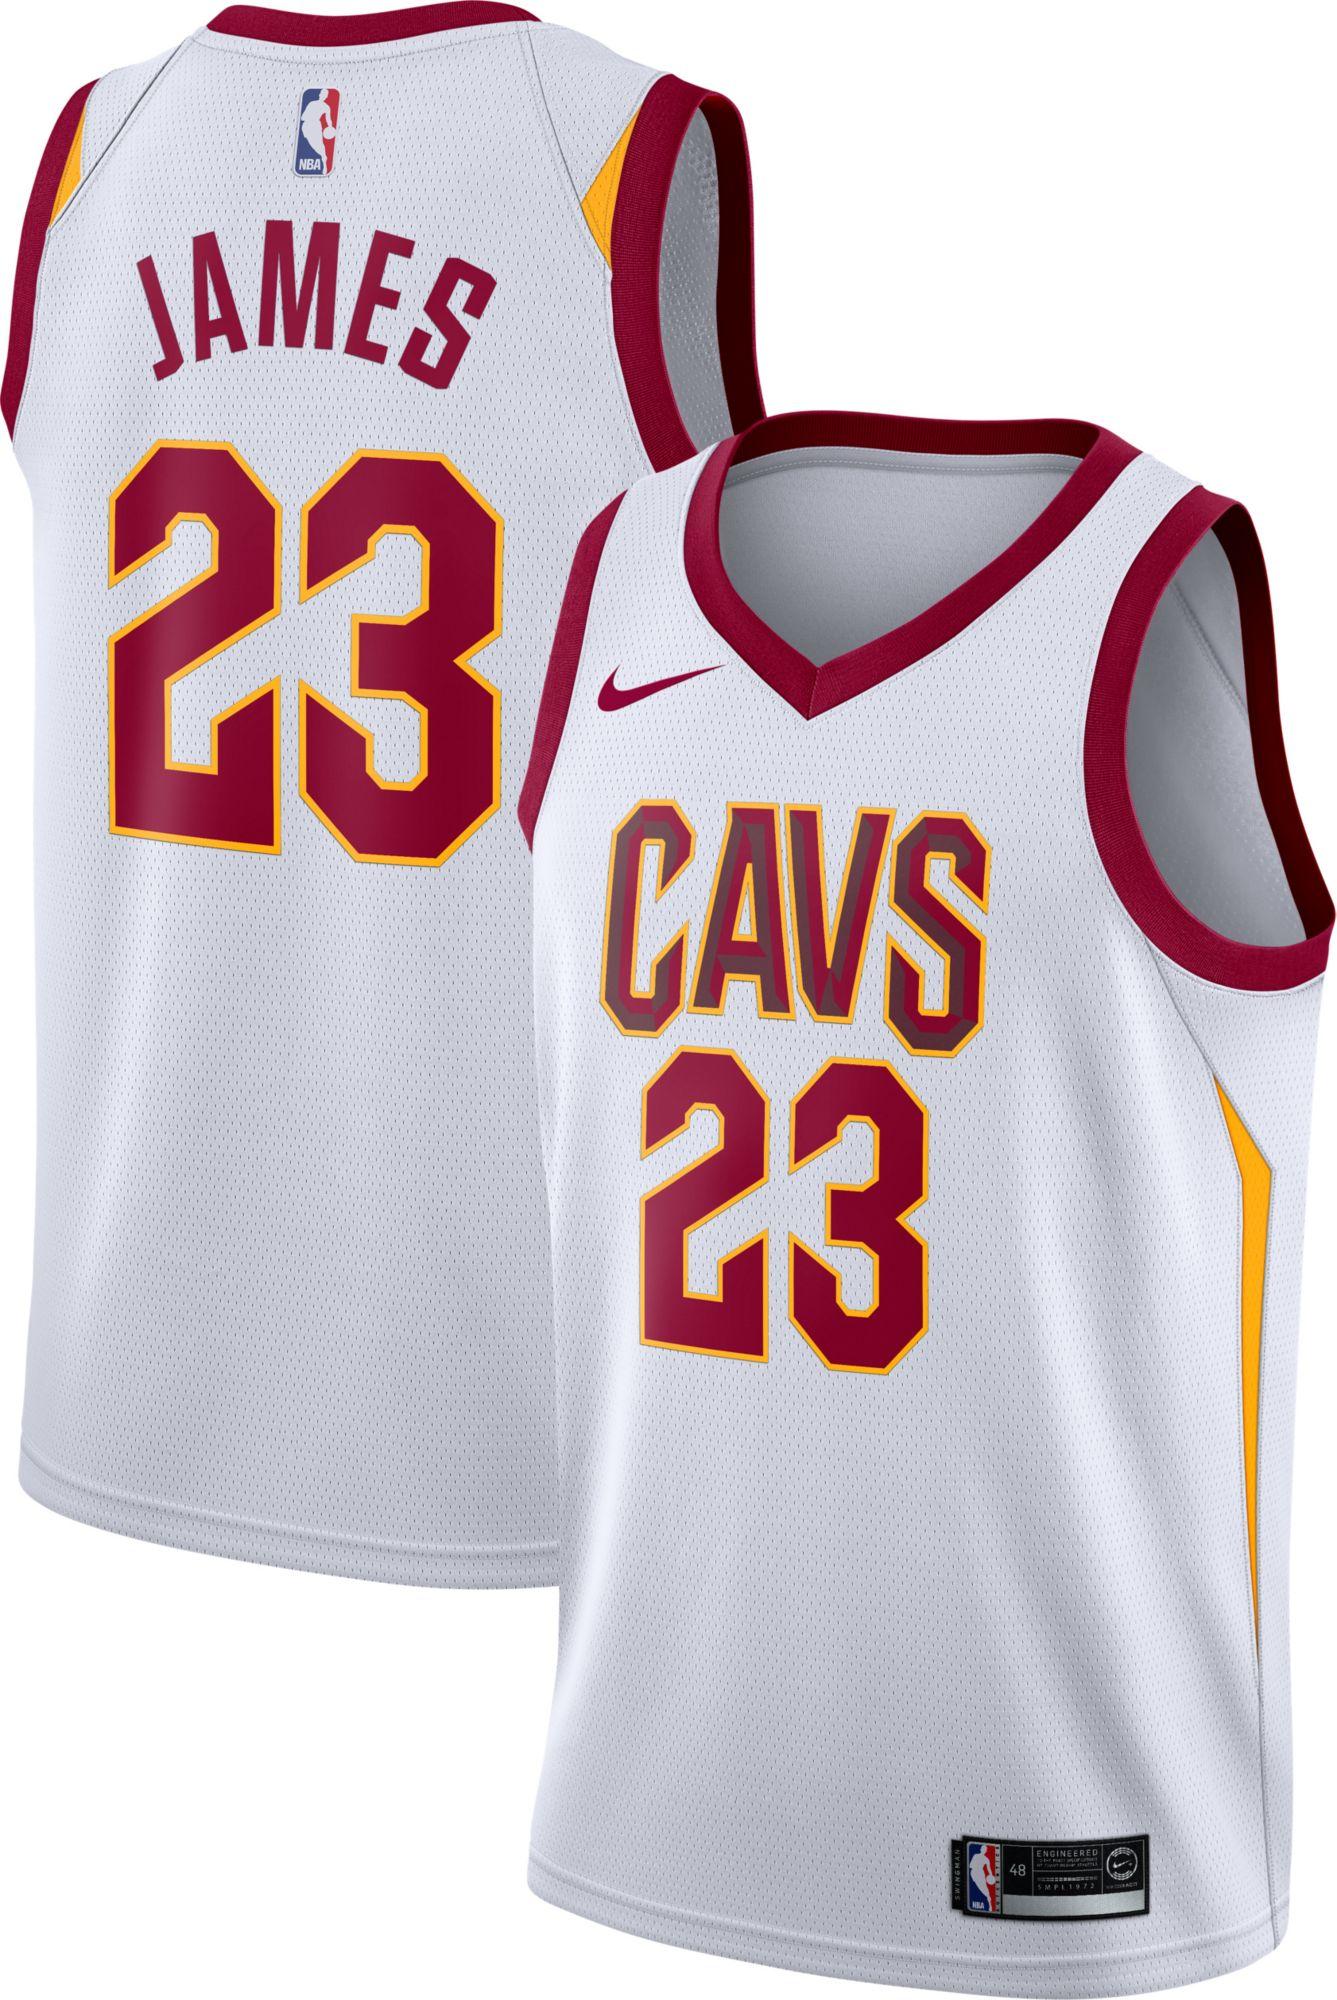 Nike Men's Cleveland Cavaliers LeBron James #23 White Dri-FIT Swingman  Jersey | DICK'S Sporting Goods